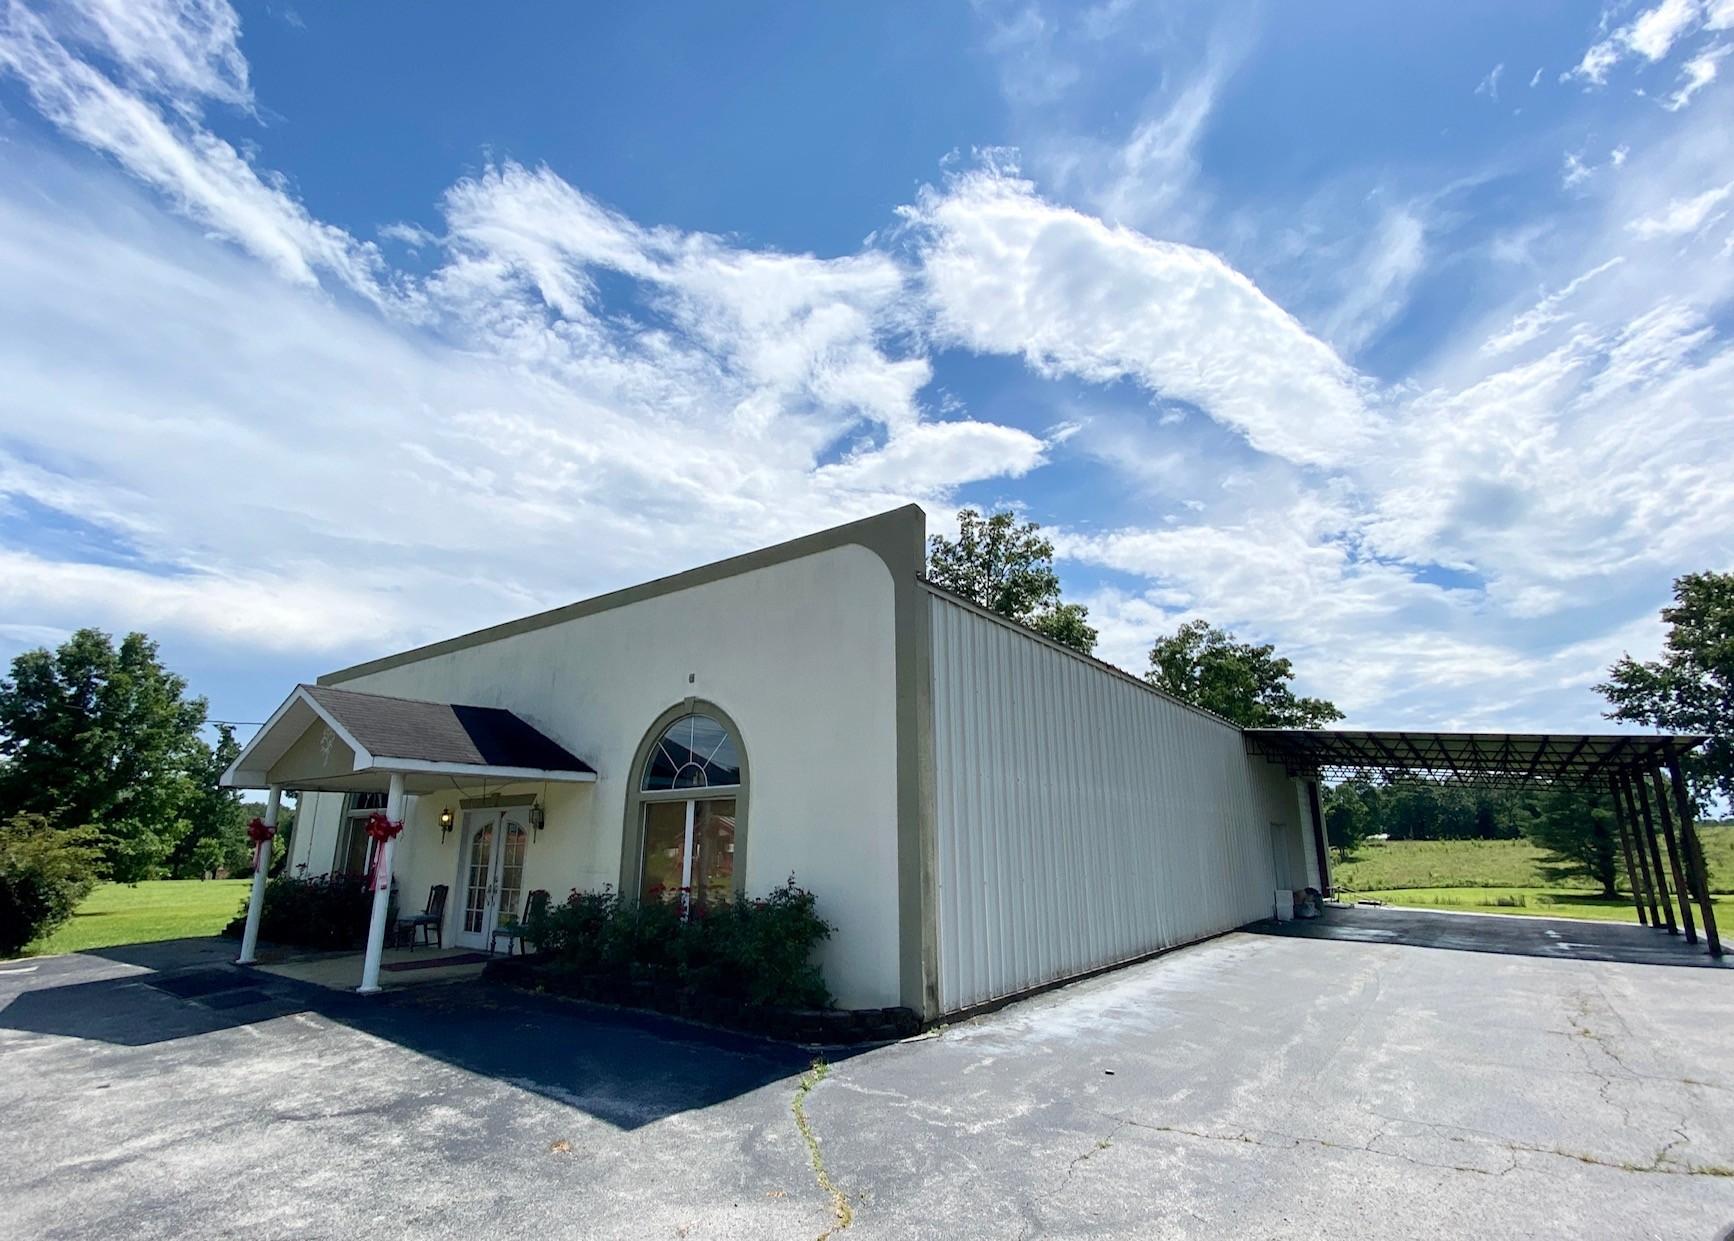 9787 SR-56 Property Photo - Coalmont, TN real estate listing